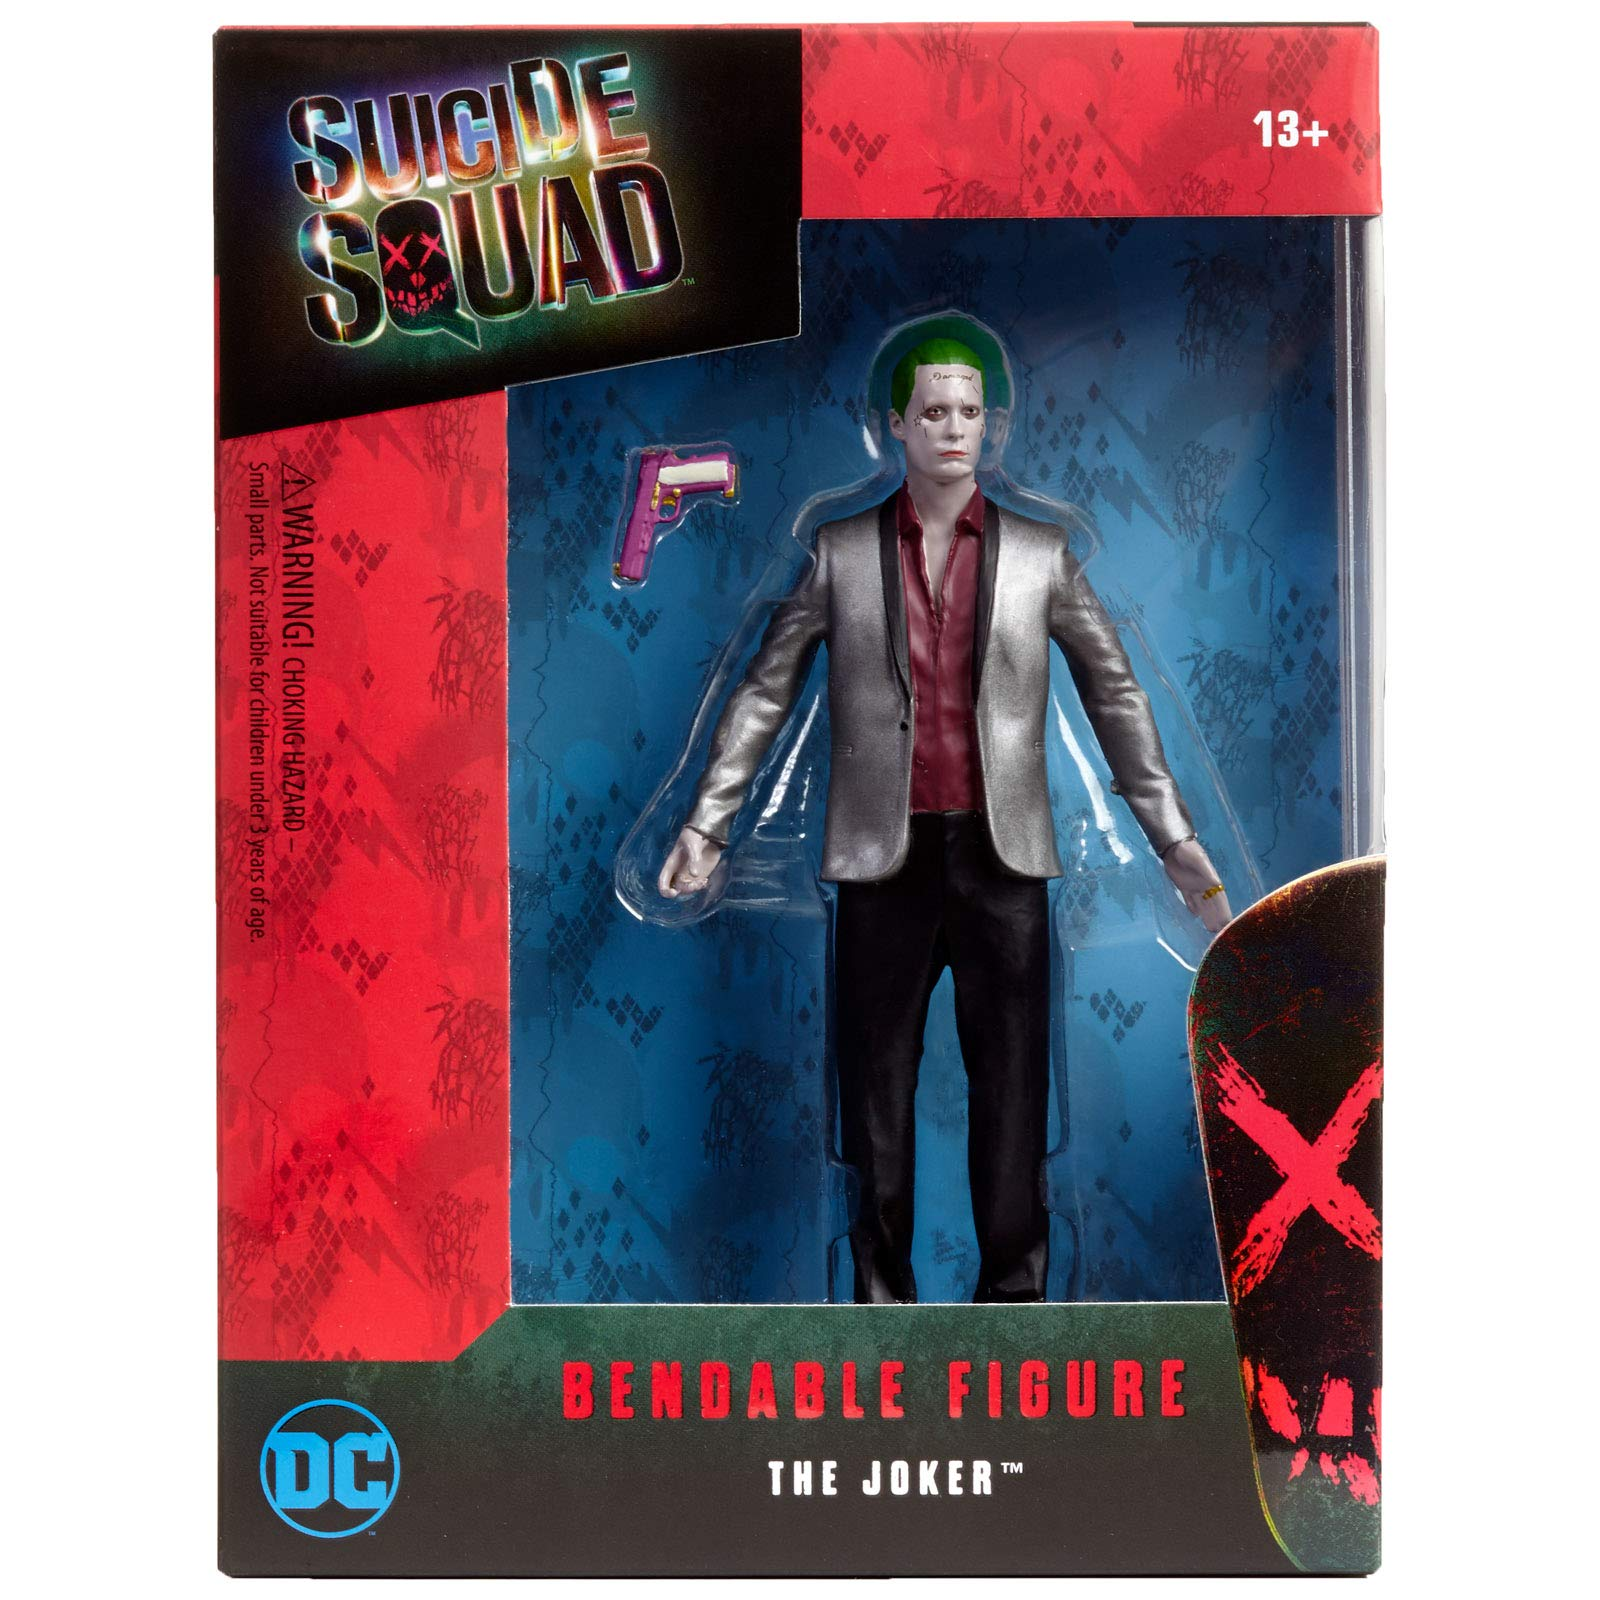 NJ Croce Suicide Squad Movie Joker Bendable Figure, Multi Color (6-inch) product image